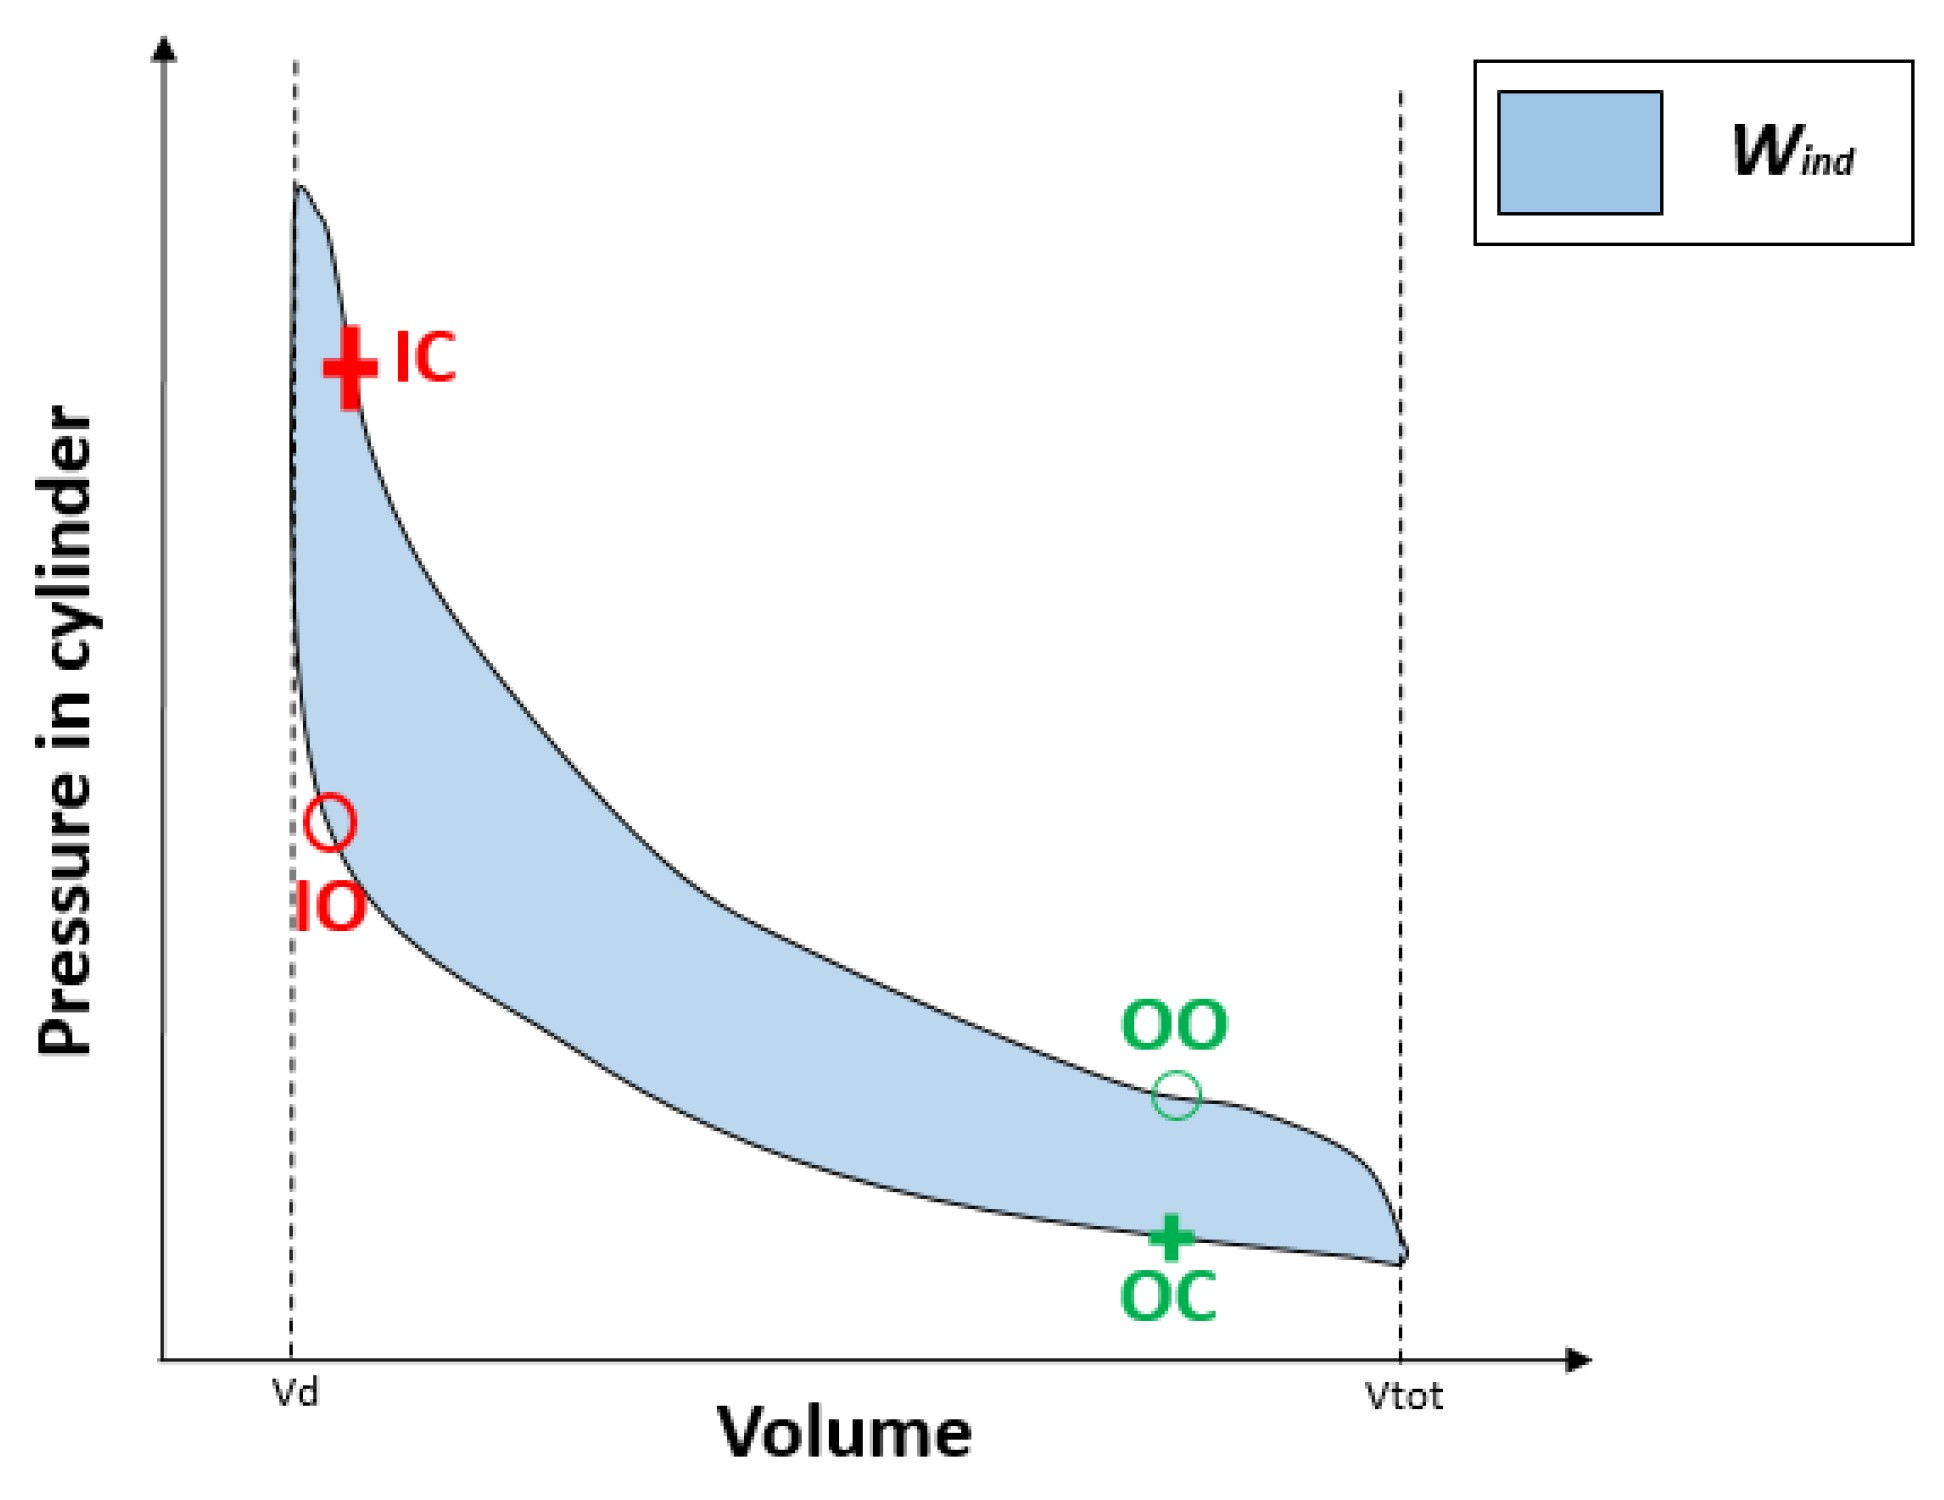 Pv Diagram Of 4 Stroke Engine Energies Free Full Text Of Pv Diagram Of 4 Stroke Engine